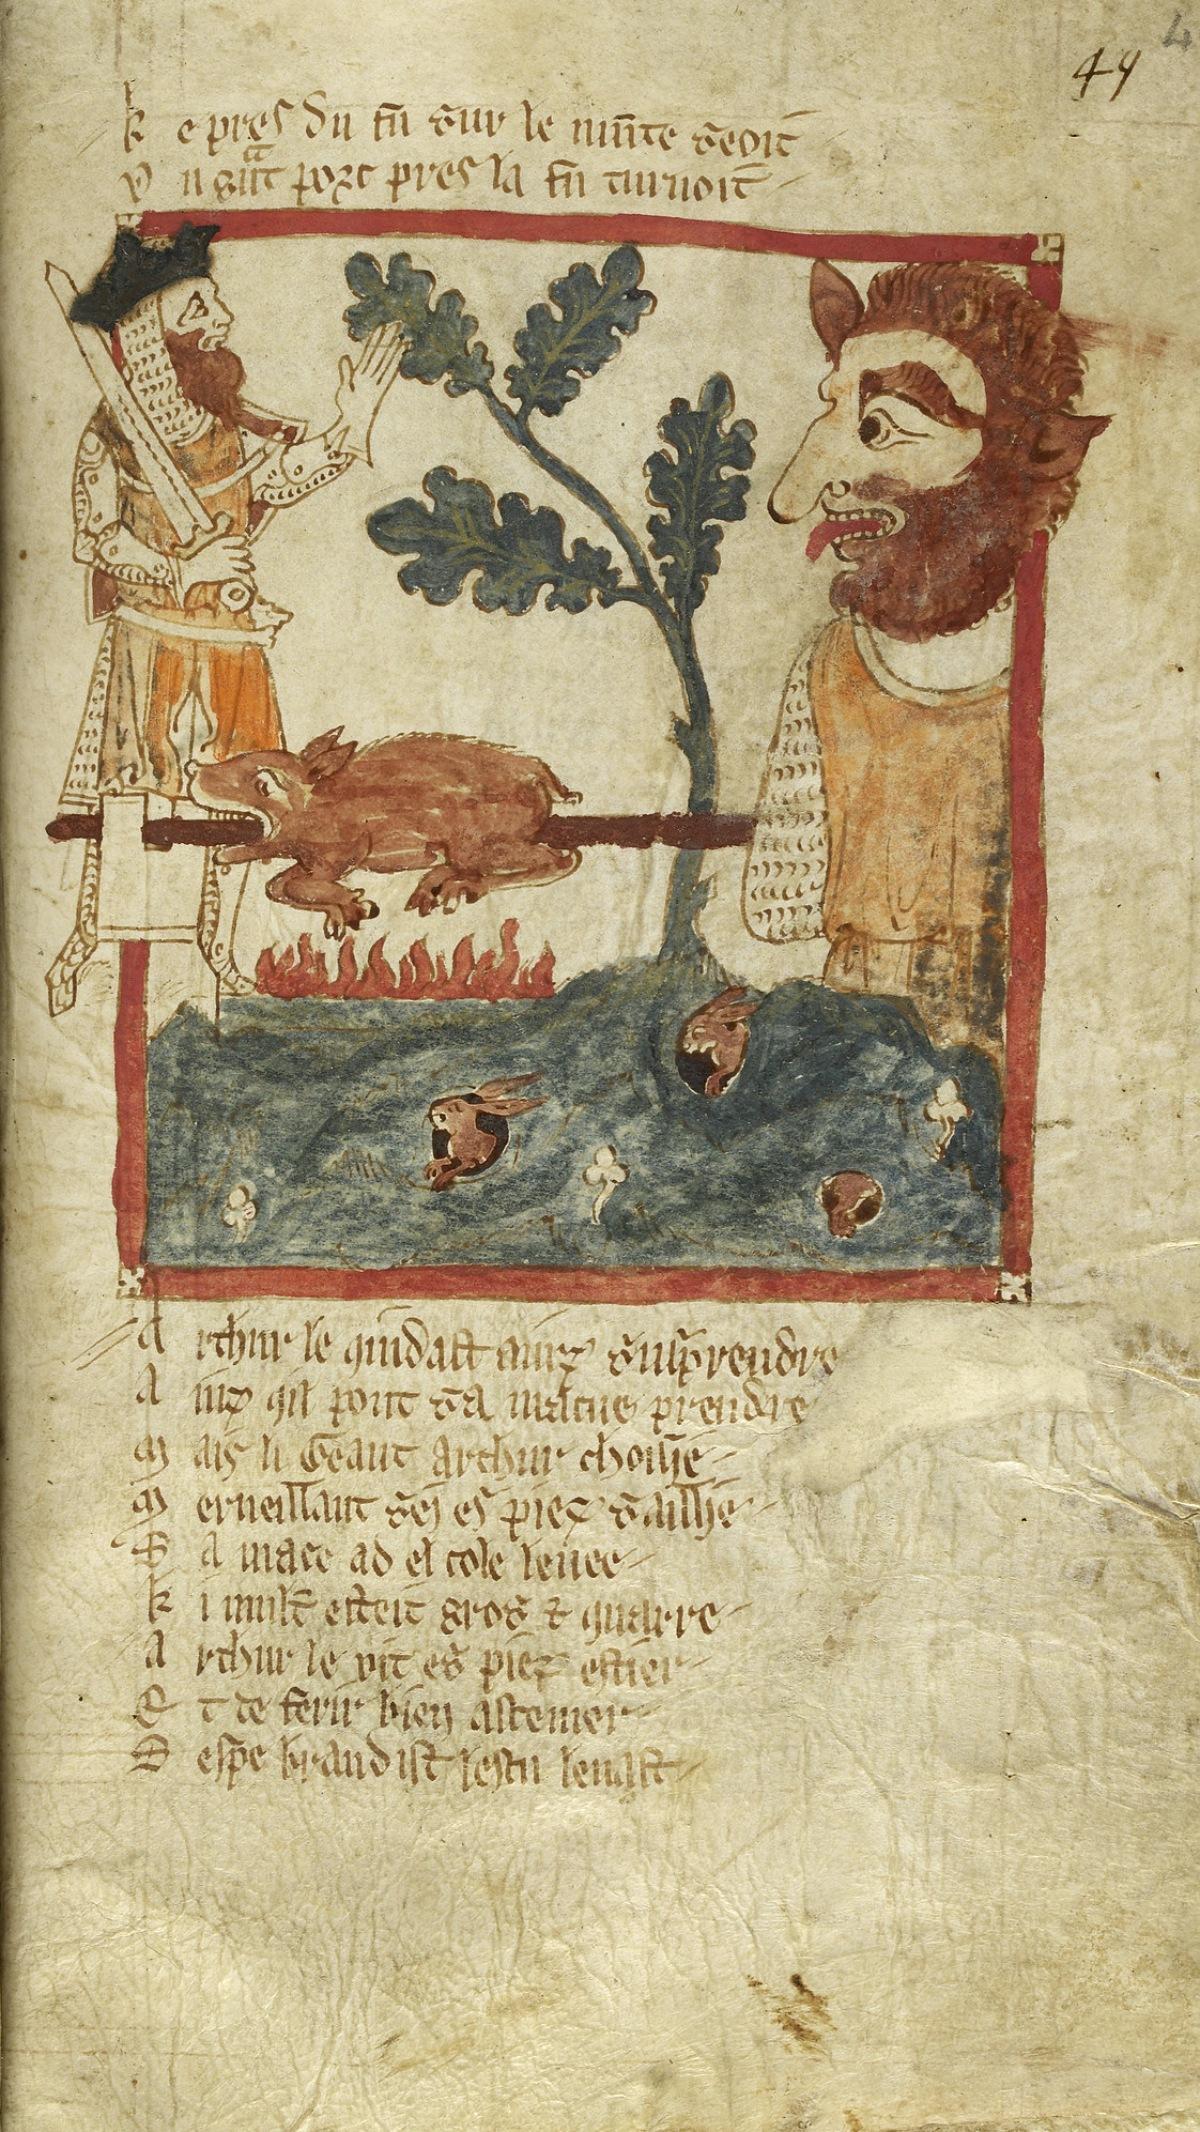 14th Century manuscript on King Arthur